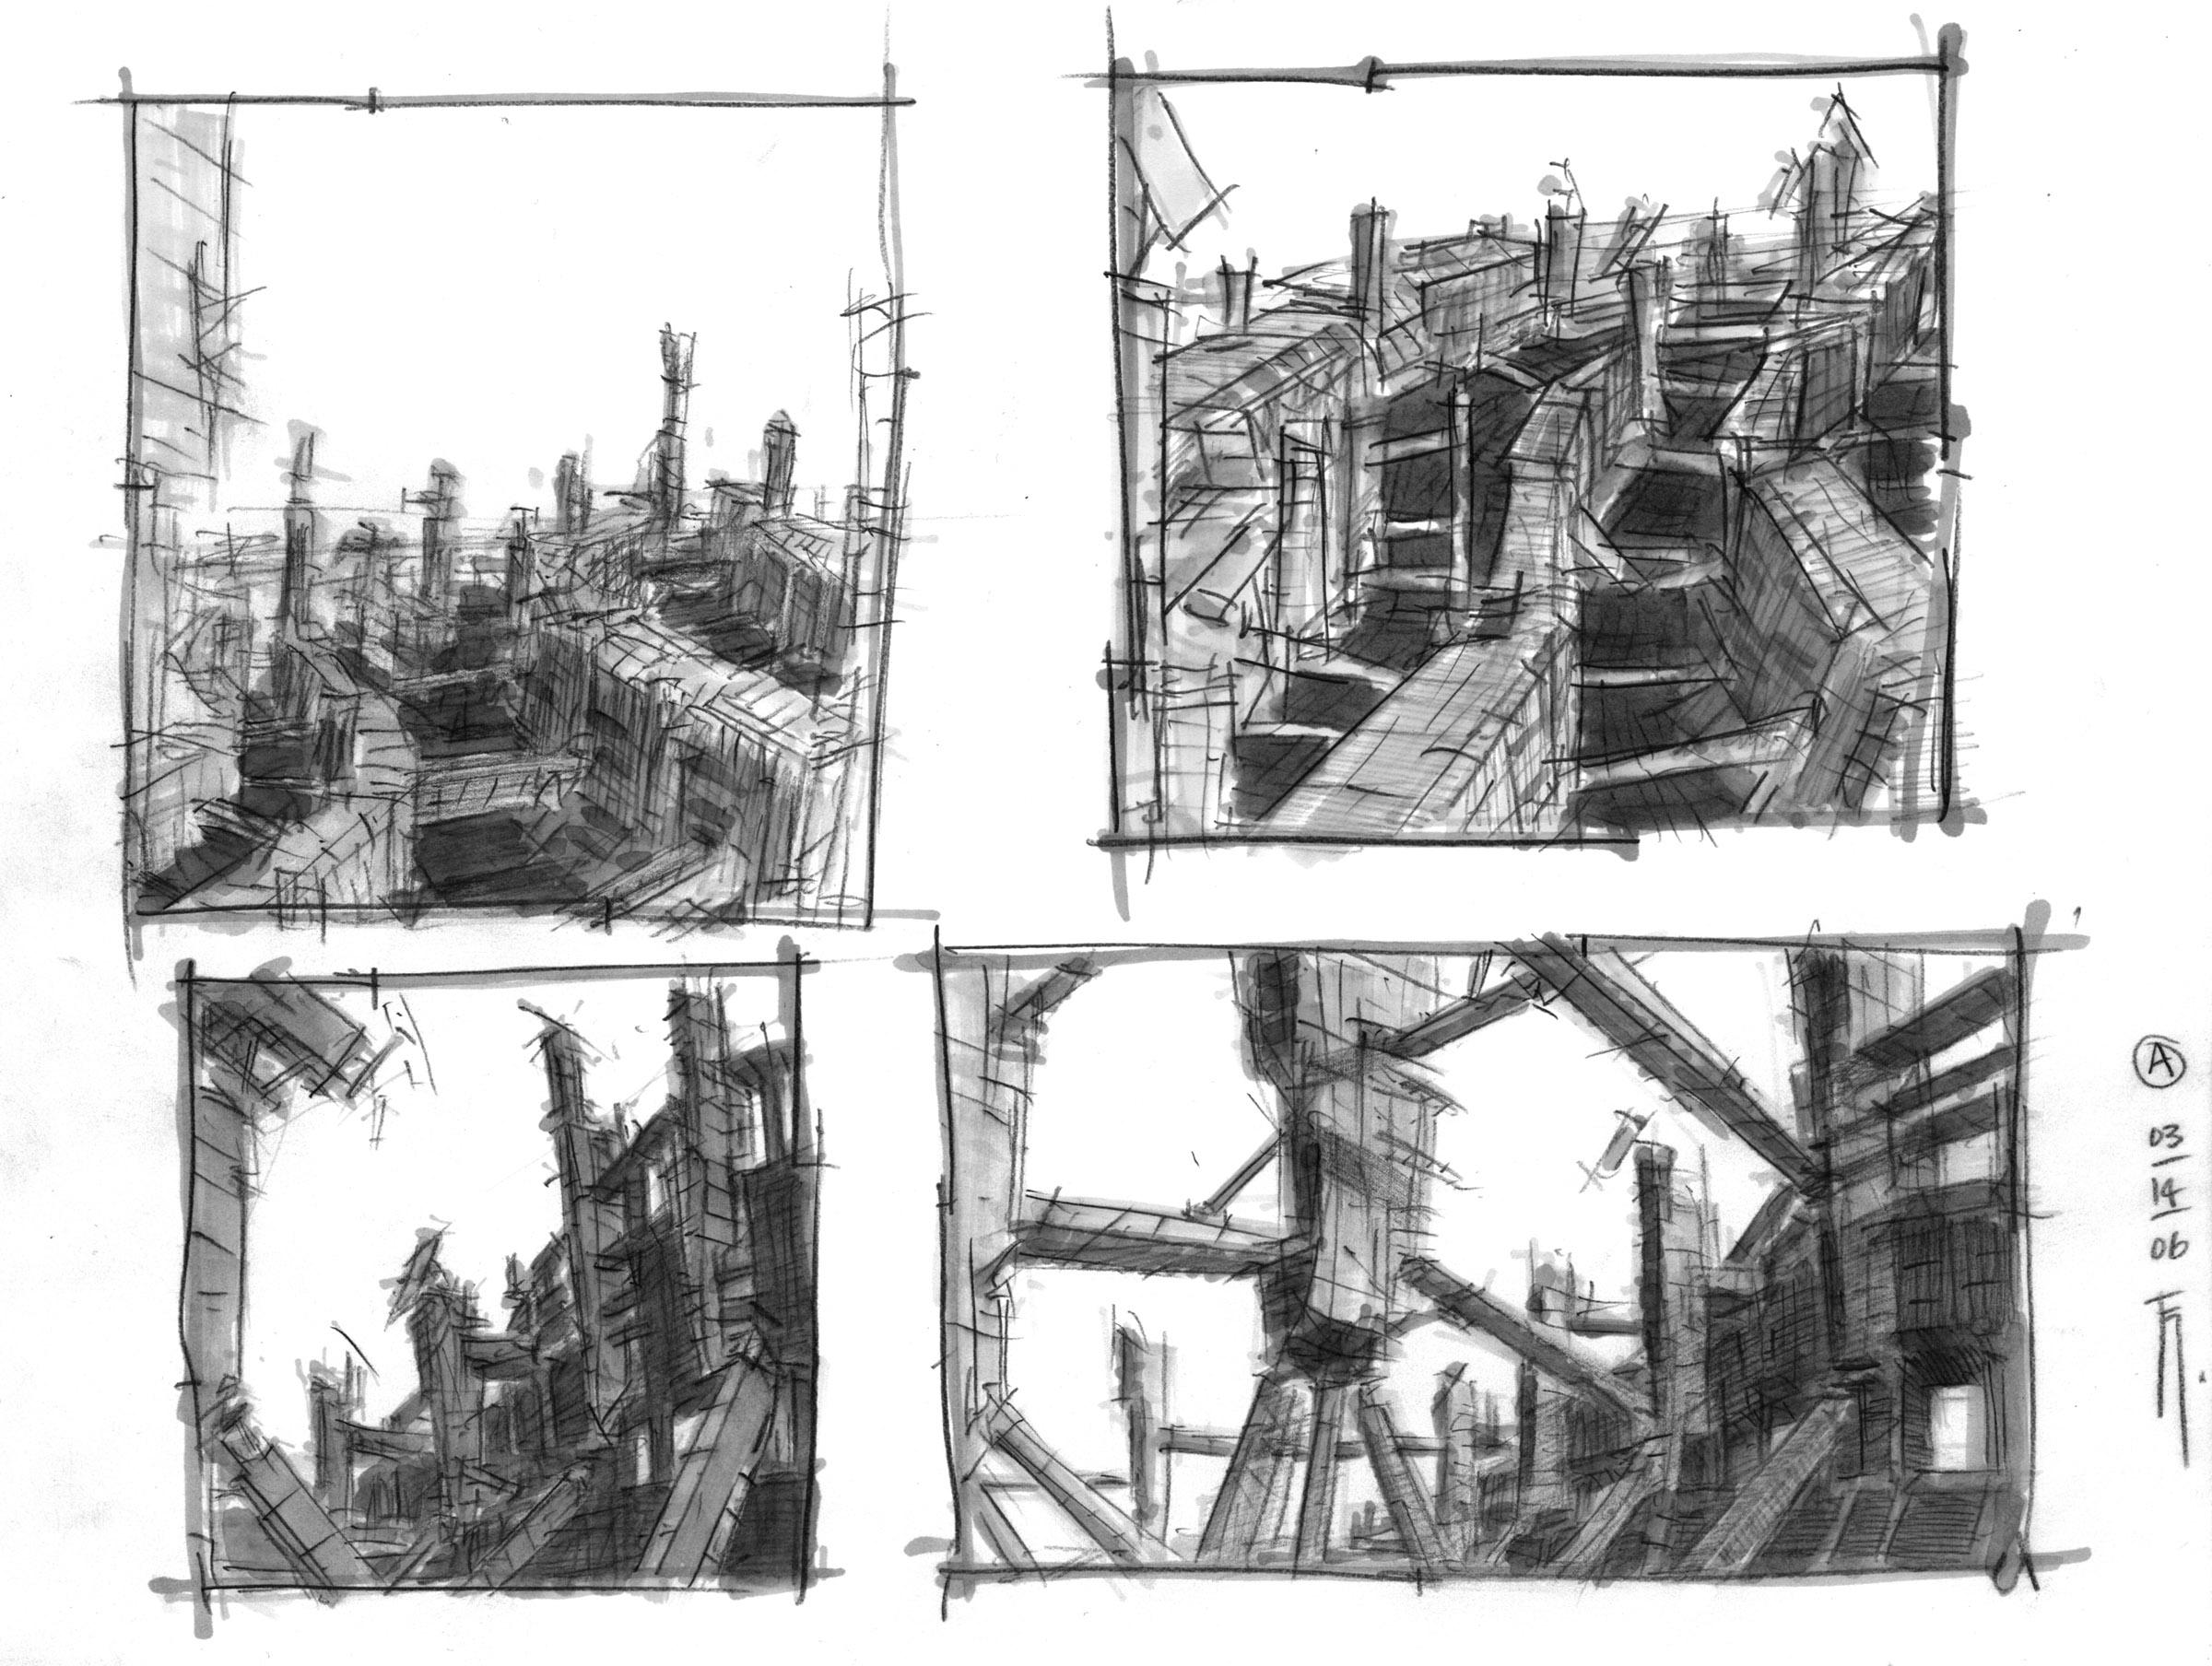 TimF_Sketch_2006-03-14a.jpg